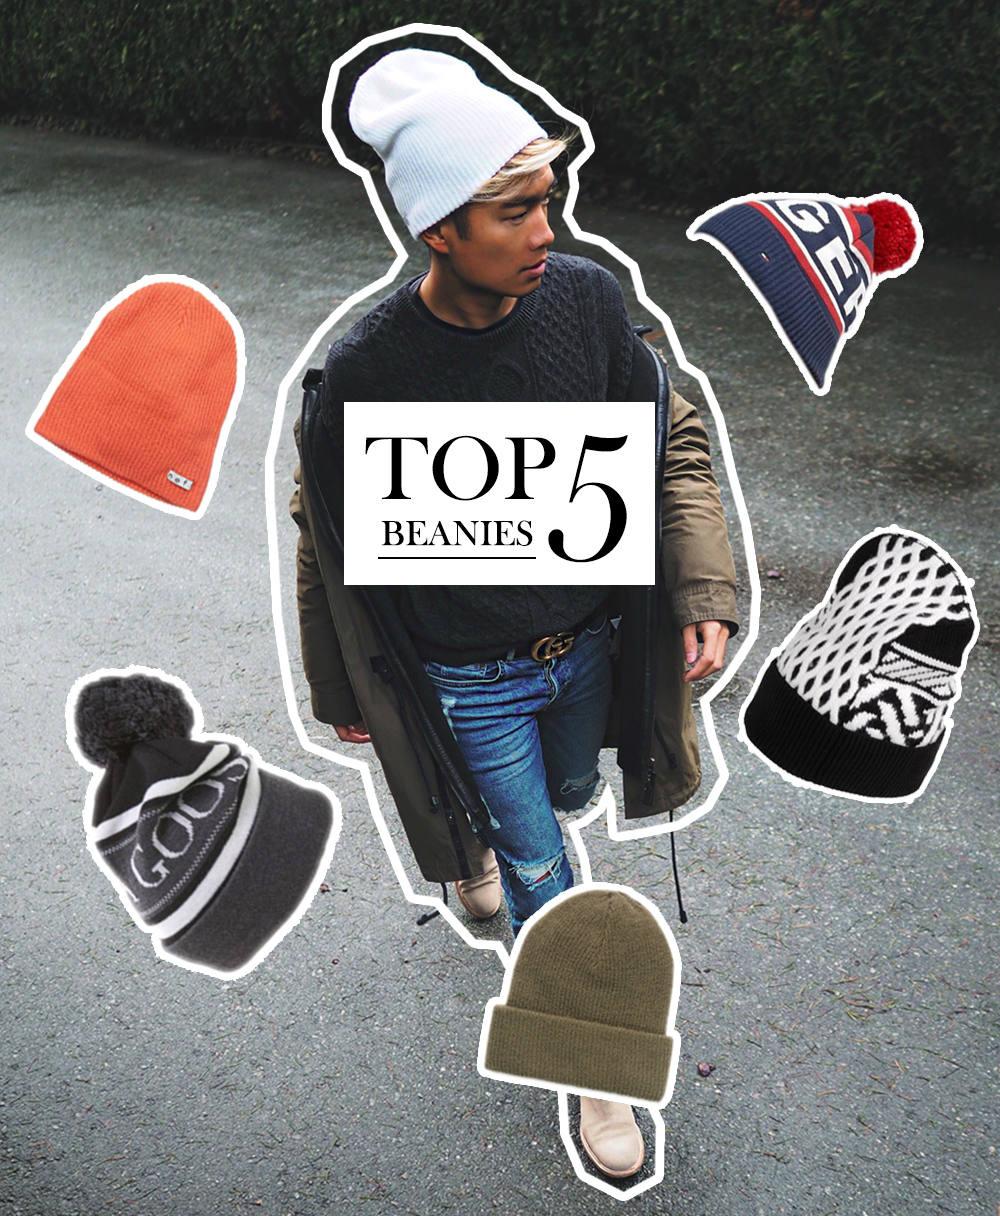 Top 5: Beanies